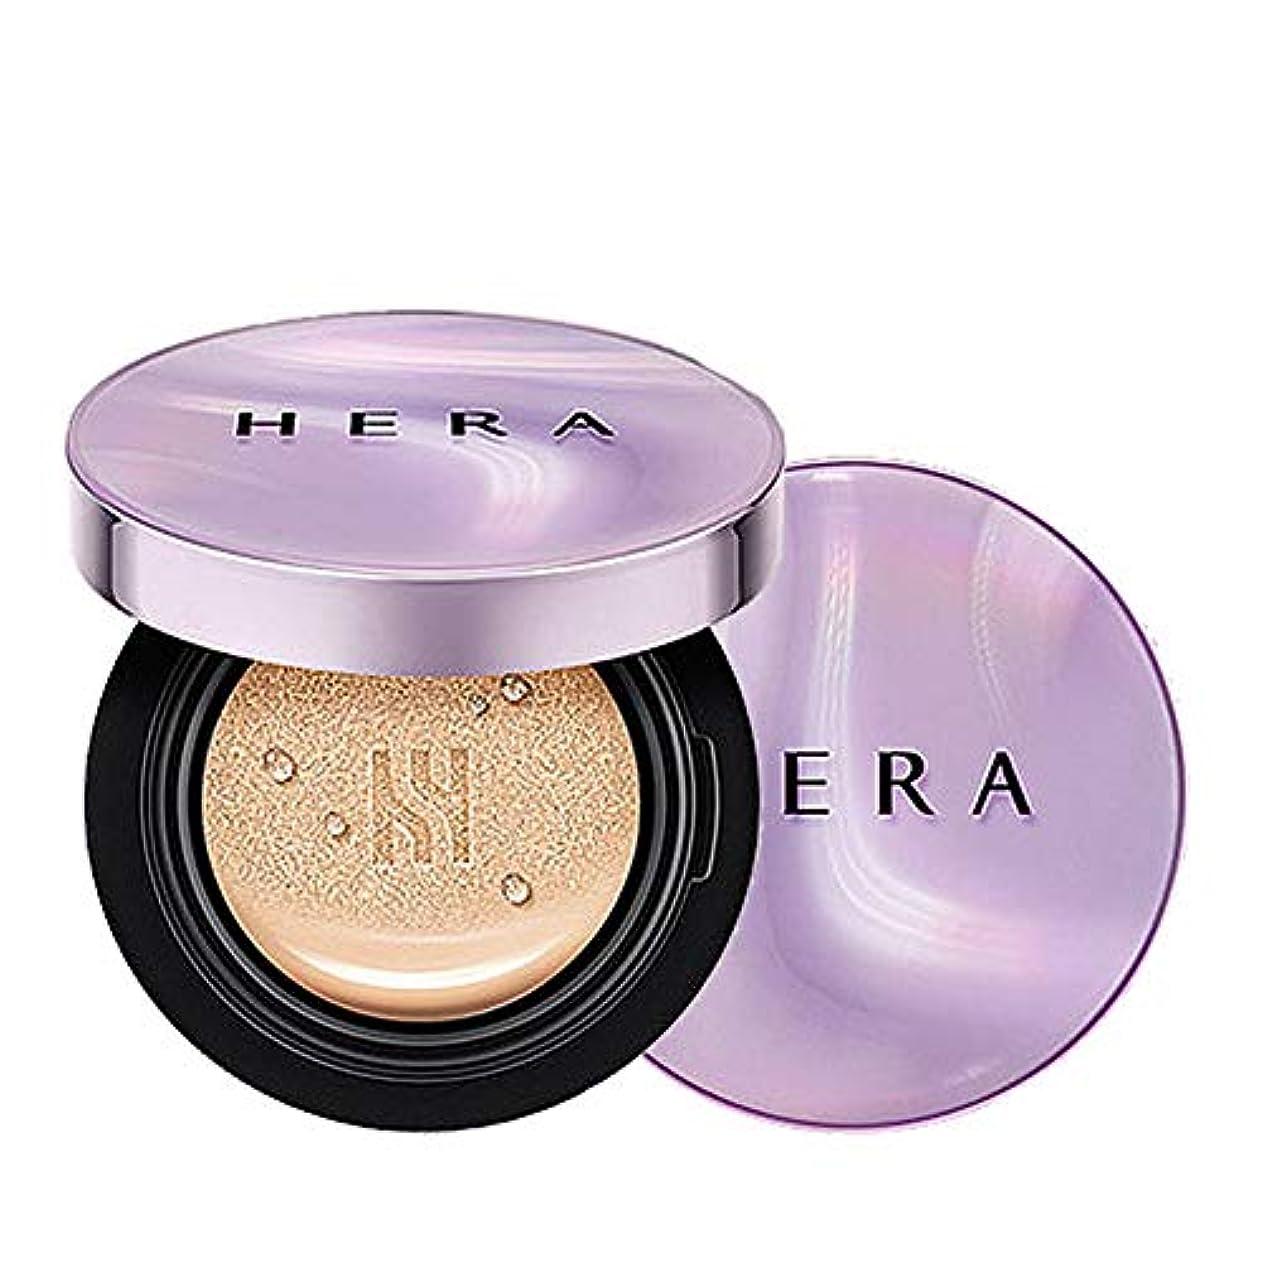 HERA(ヘラ) UVミストクッション ウルトラモイスチャー SPF34/PA++ [本品] (25号 アンバー)